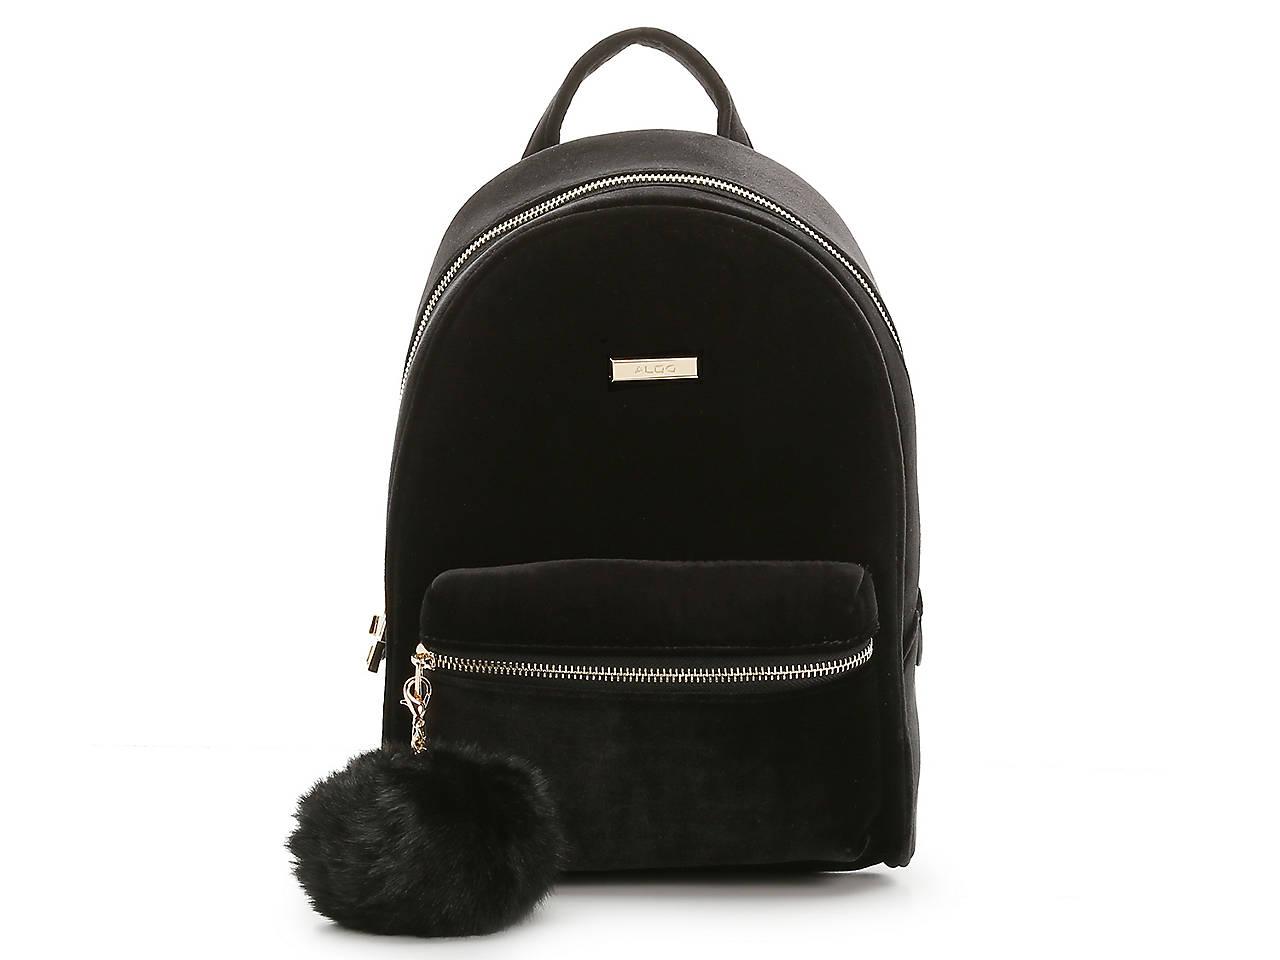 92b9cf13aaa Aldo Pobbio Velvet Mini Backpack Women s Handbags   Accessories